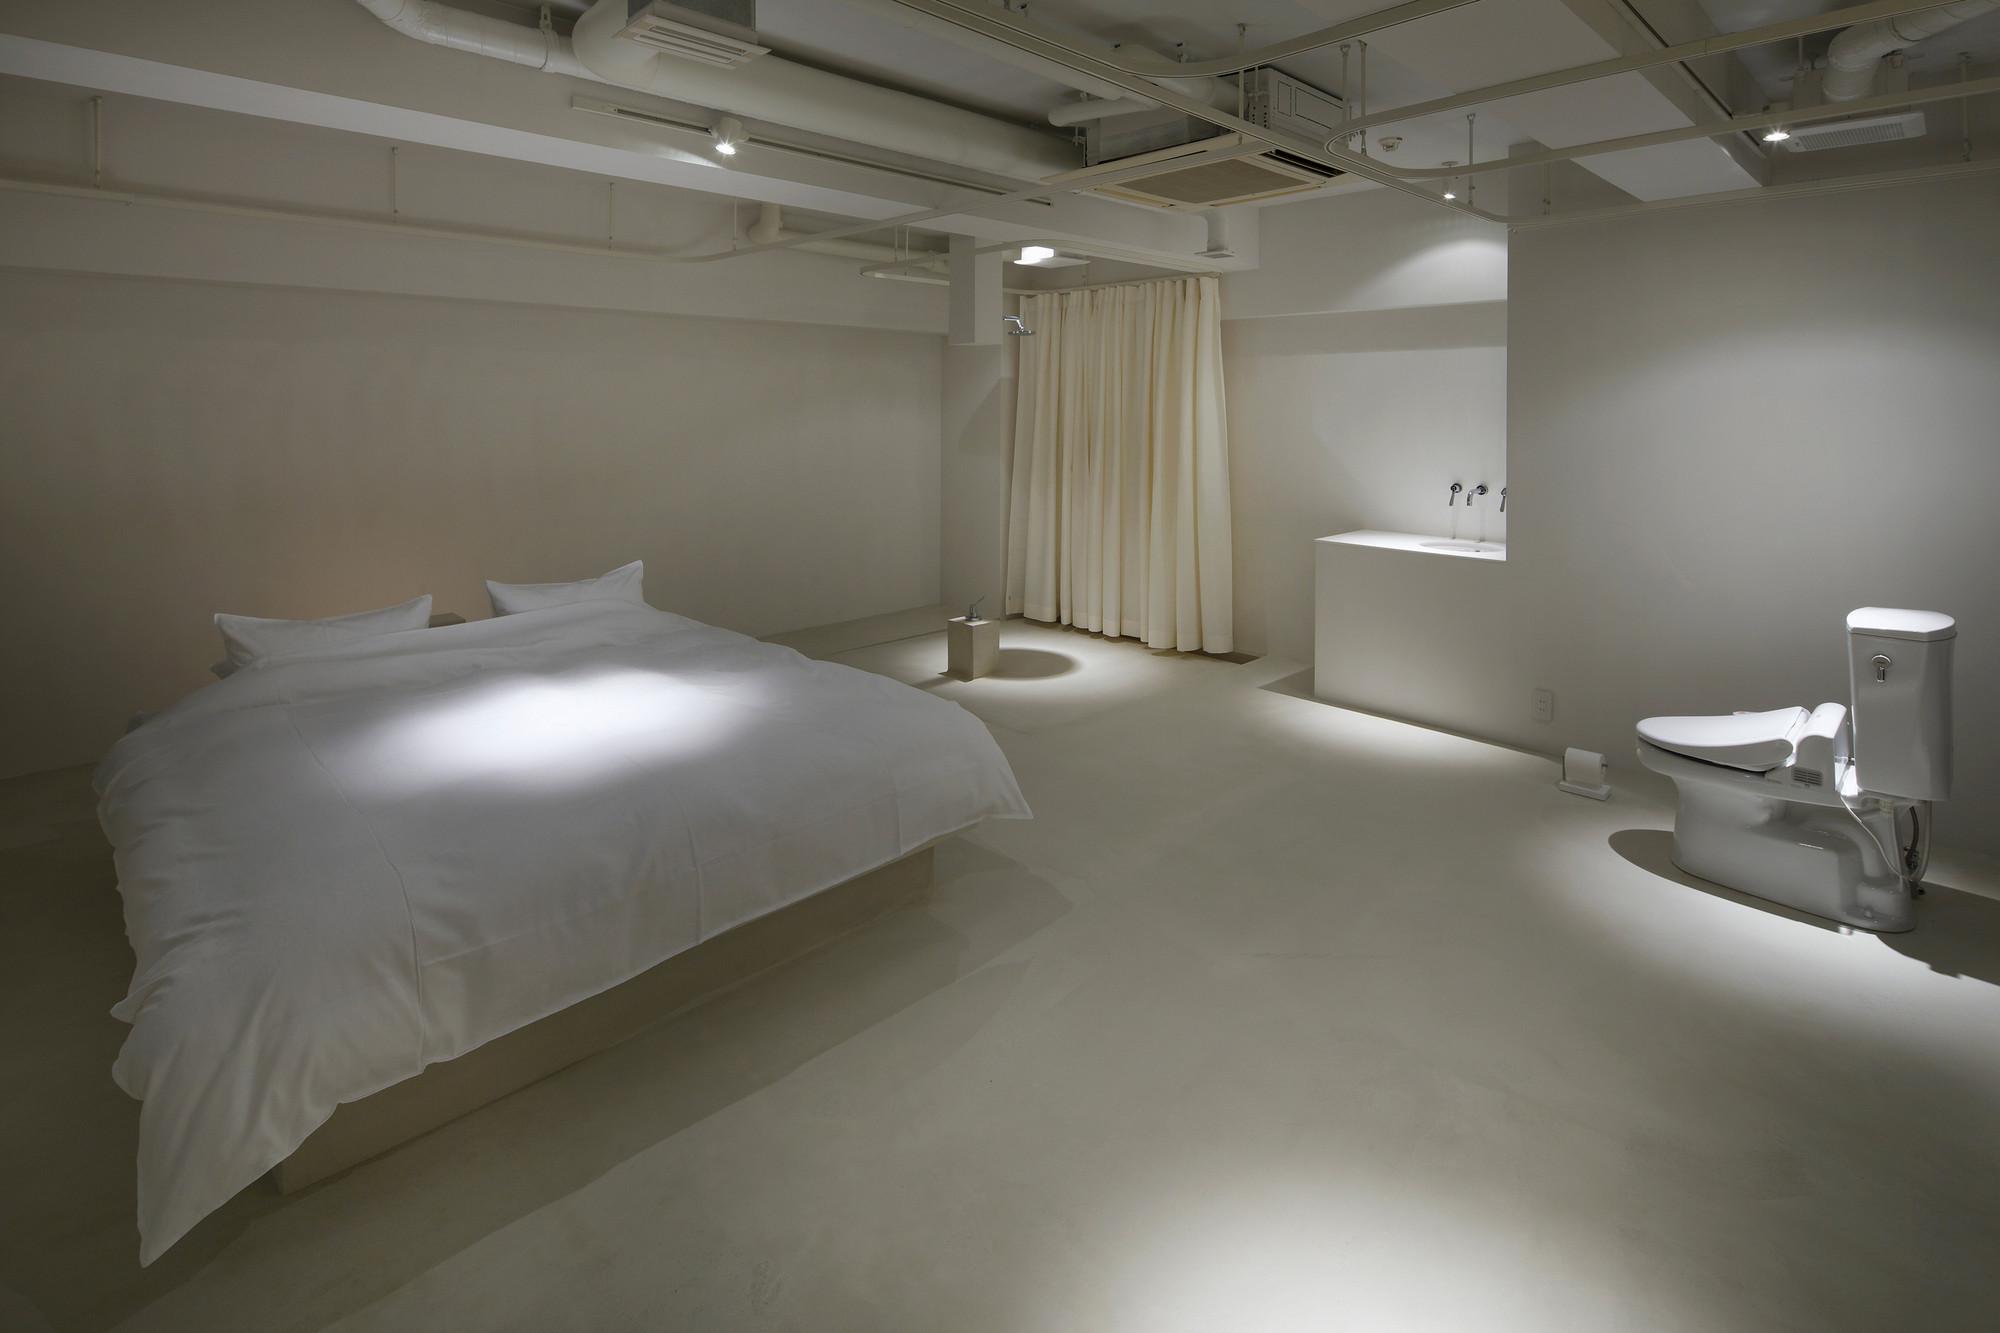 Gallery of room 211 hotel t 39 point mifune design studio 6 for Design hotel osaka